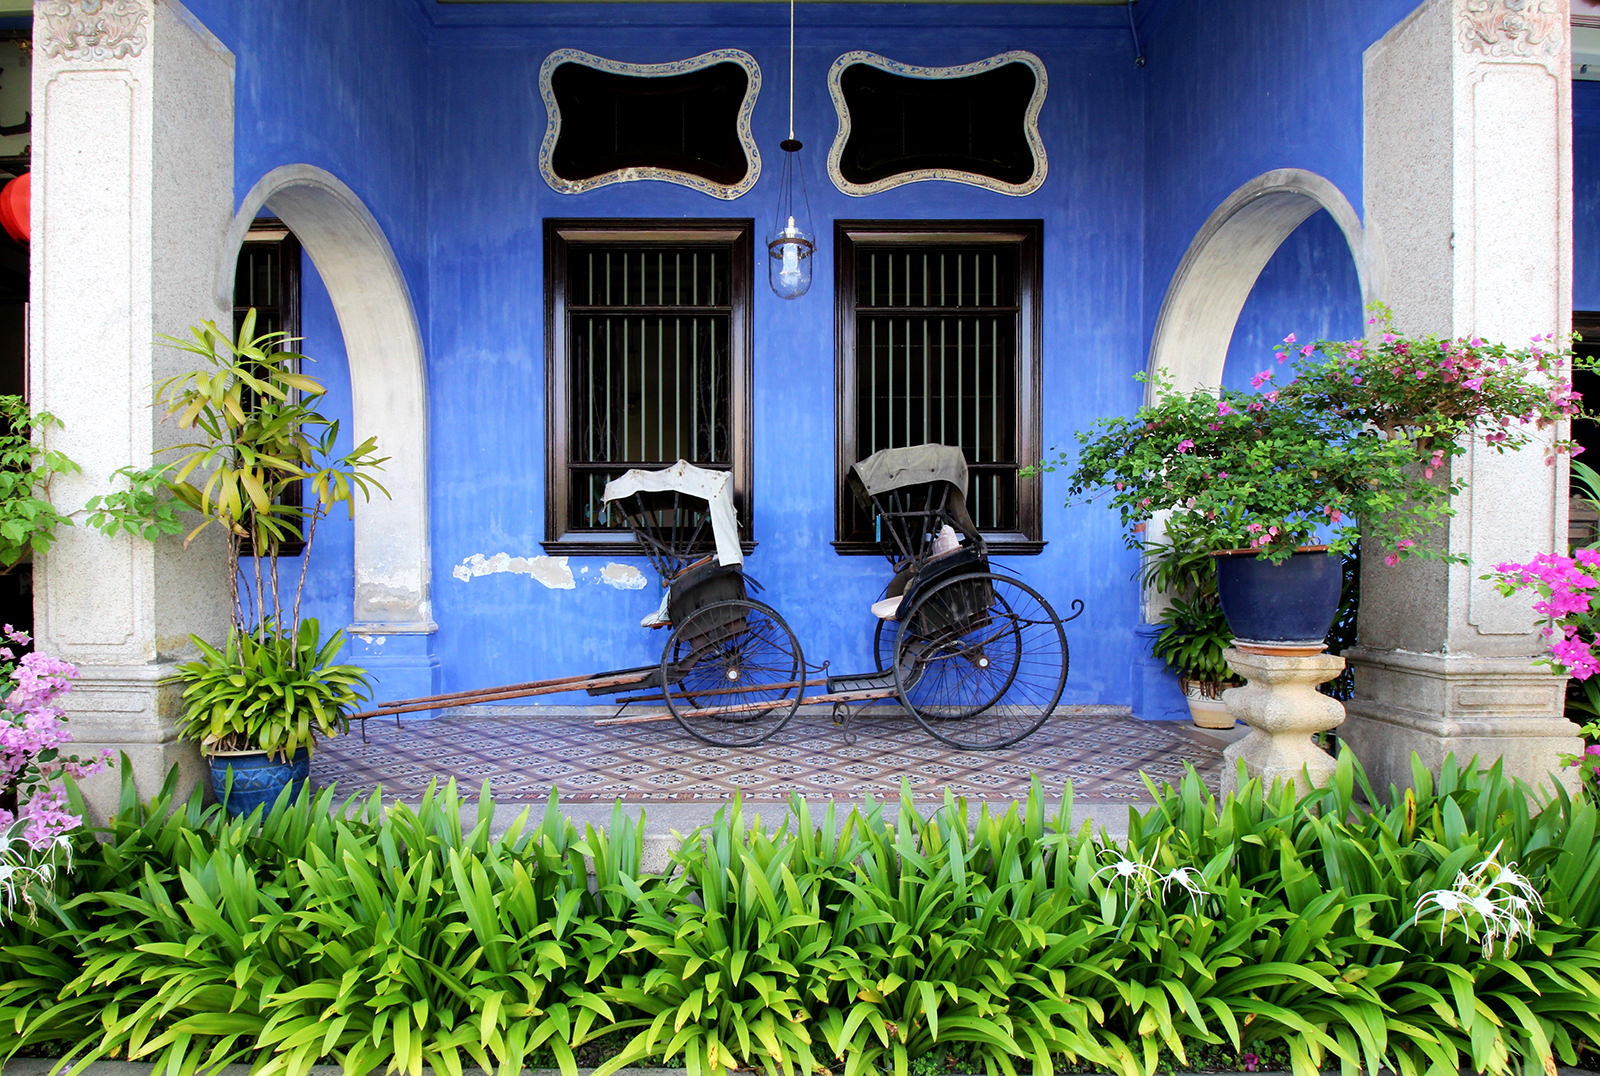 boutique-hotel-penang-island-blue-mansion-architecture-06-1 Architecture